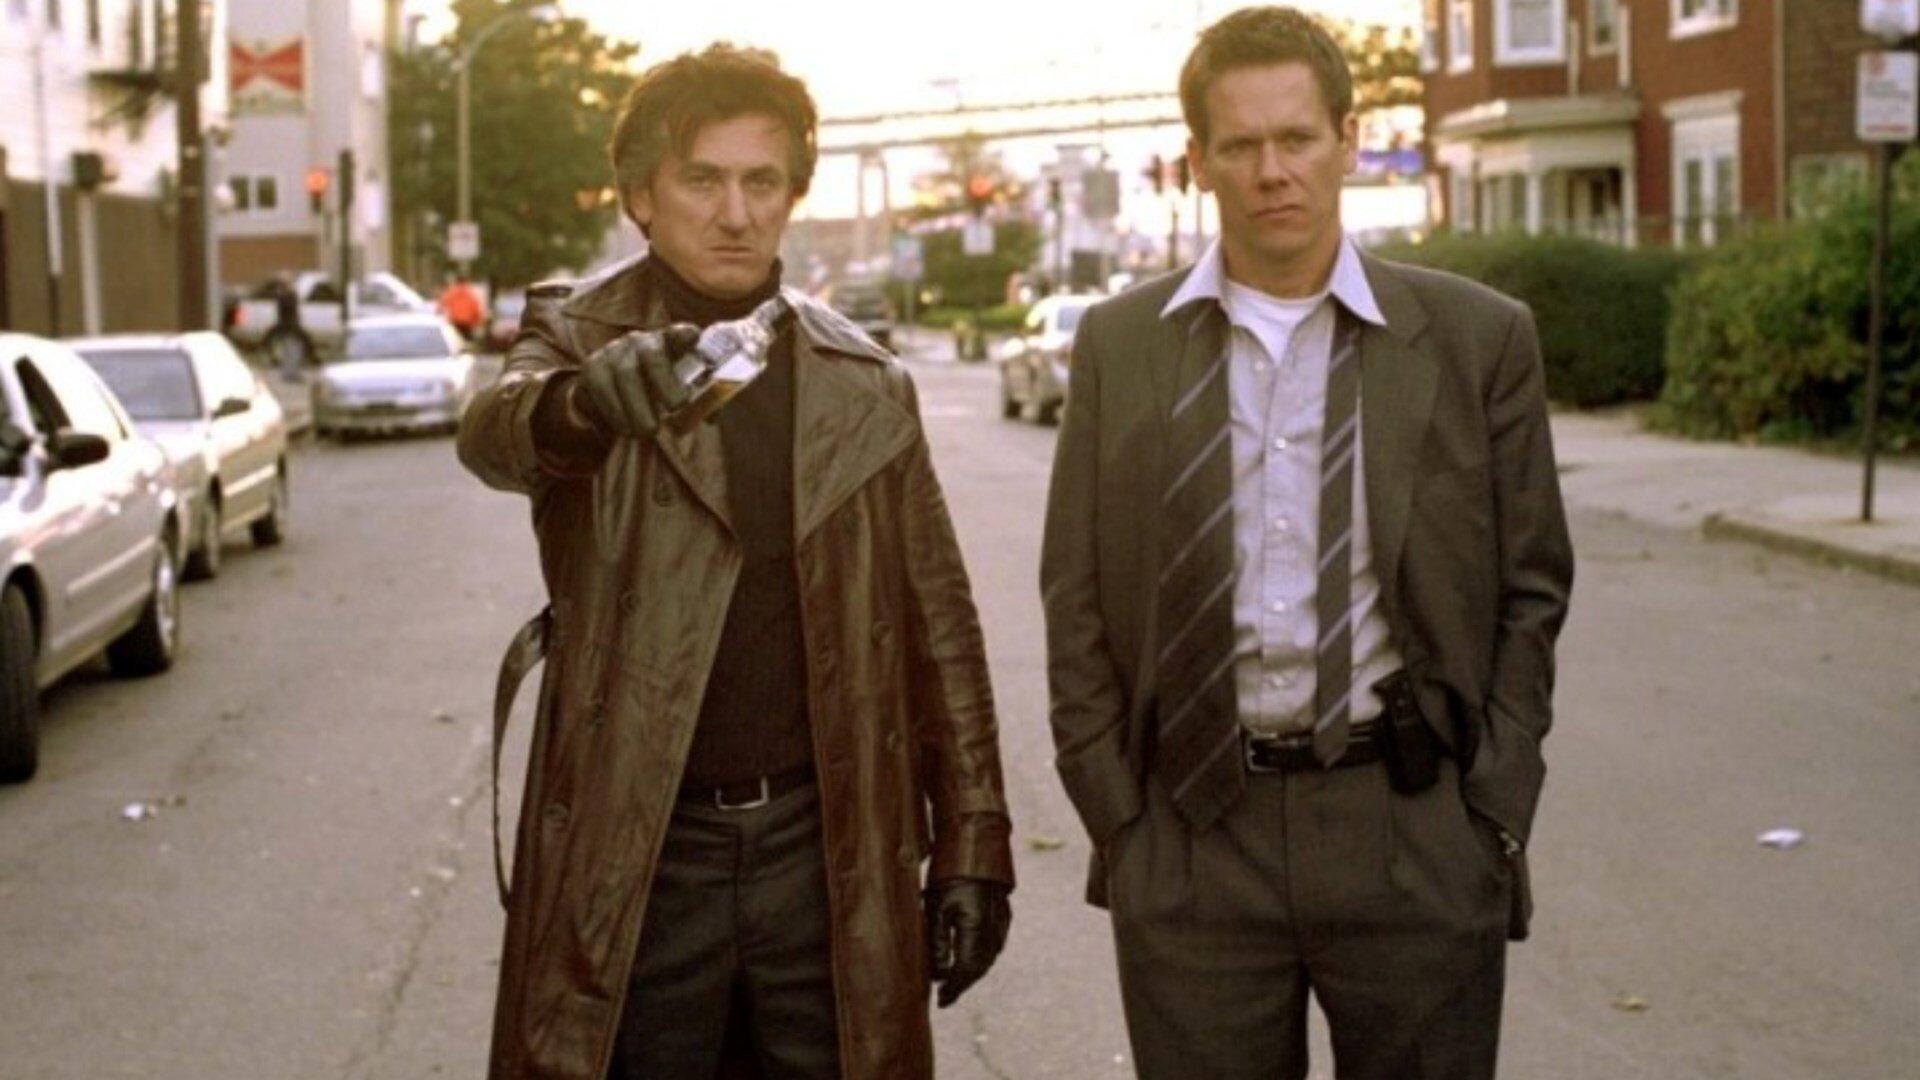 I 5 migliori thriller da vedere assolutamente